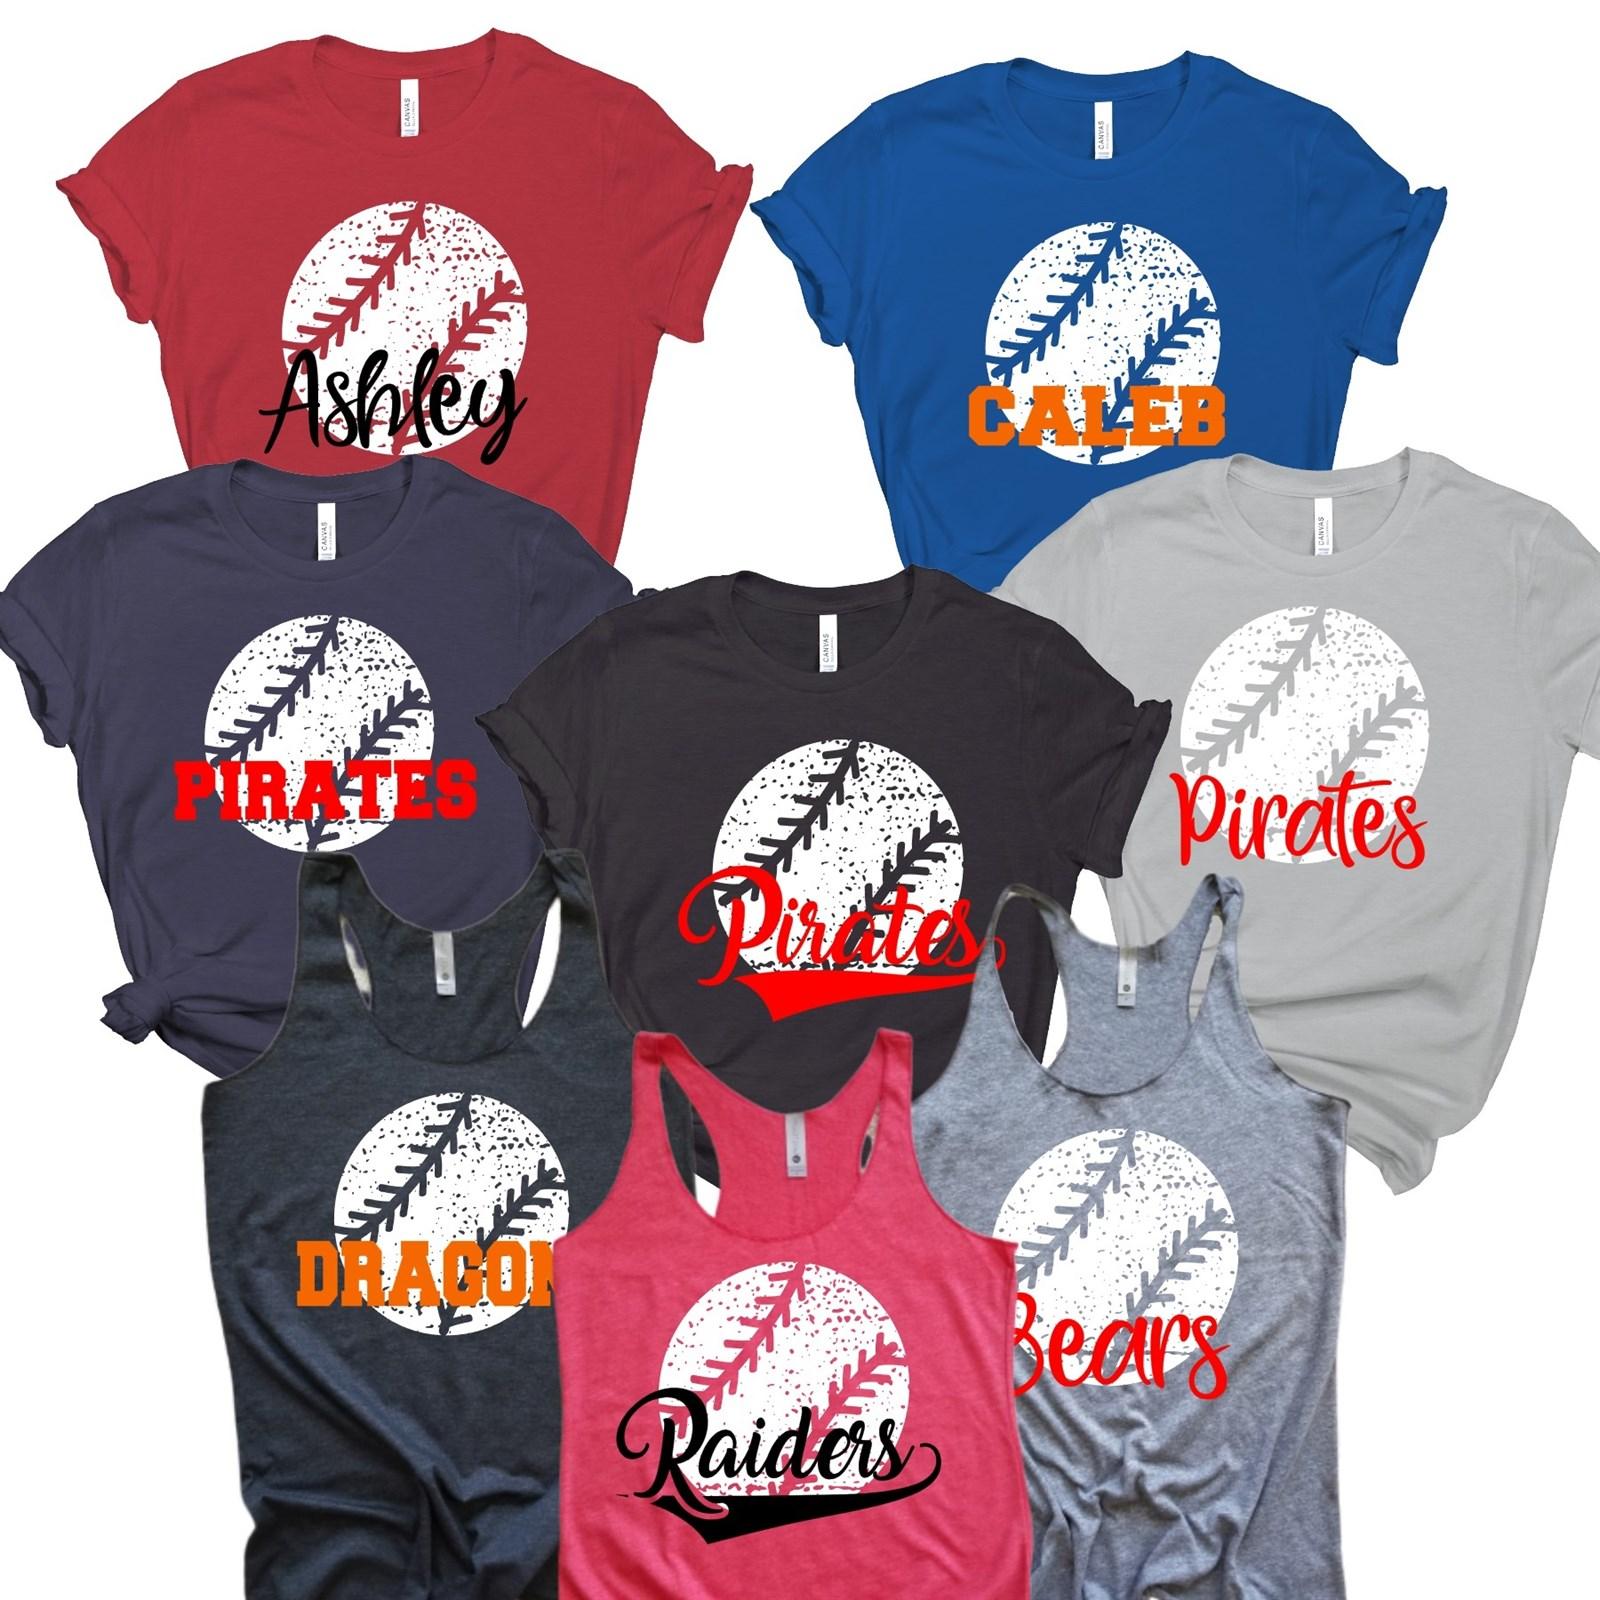 e737e4a9f825d Personalized Team Baseball Shirts | Youth-Adult